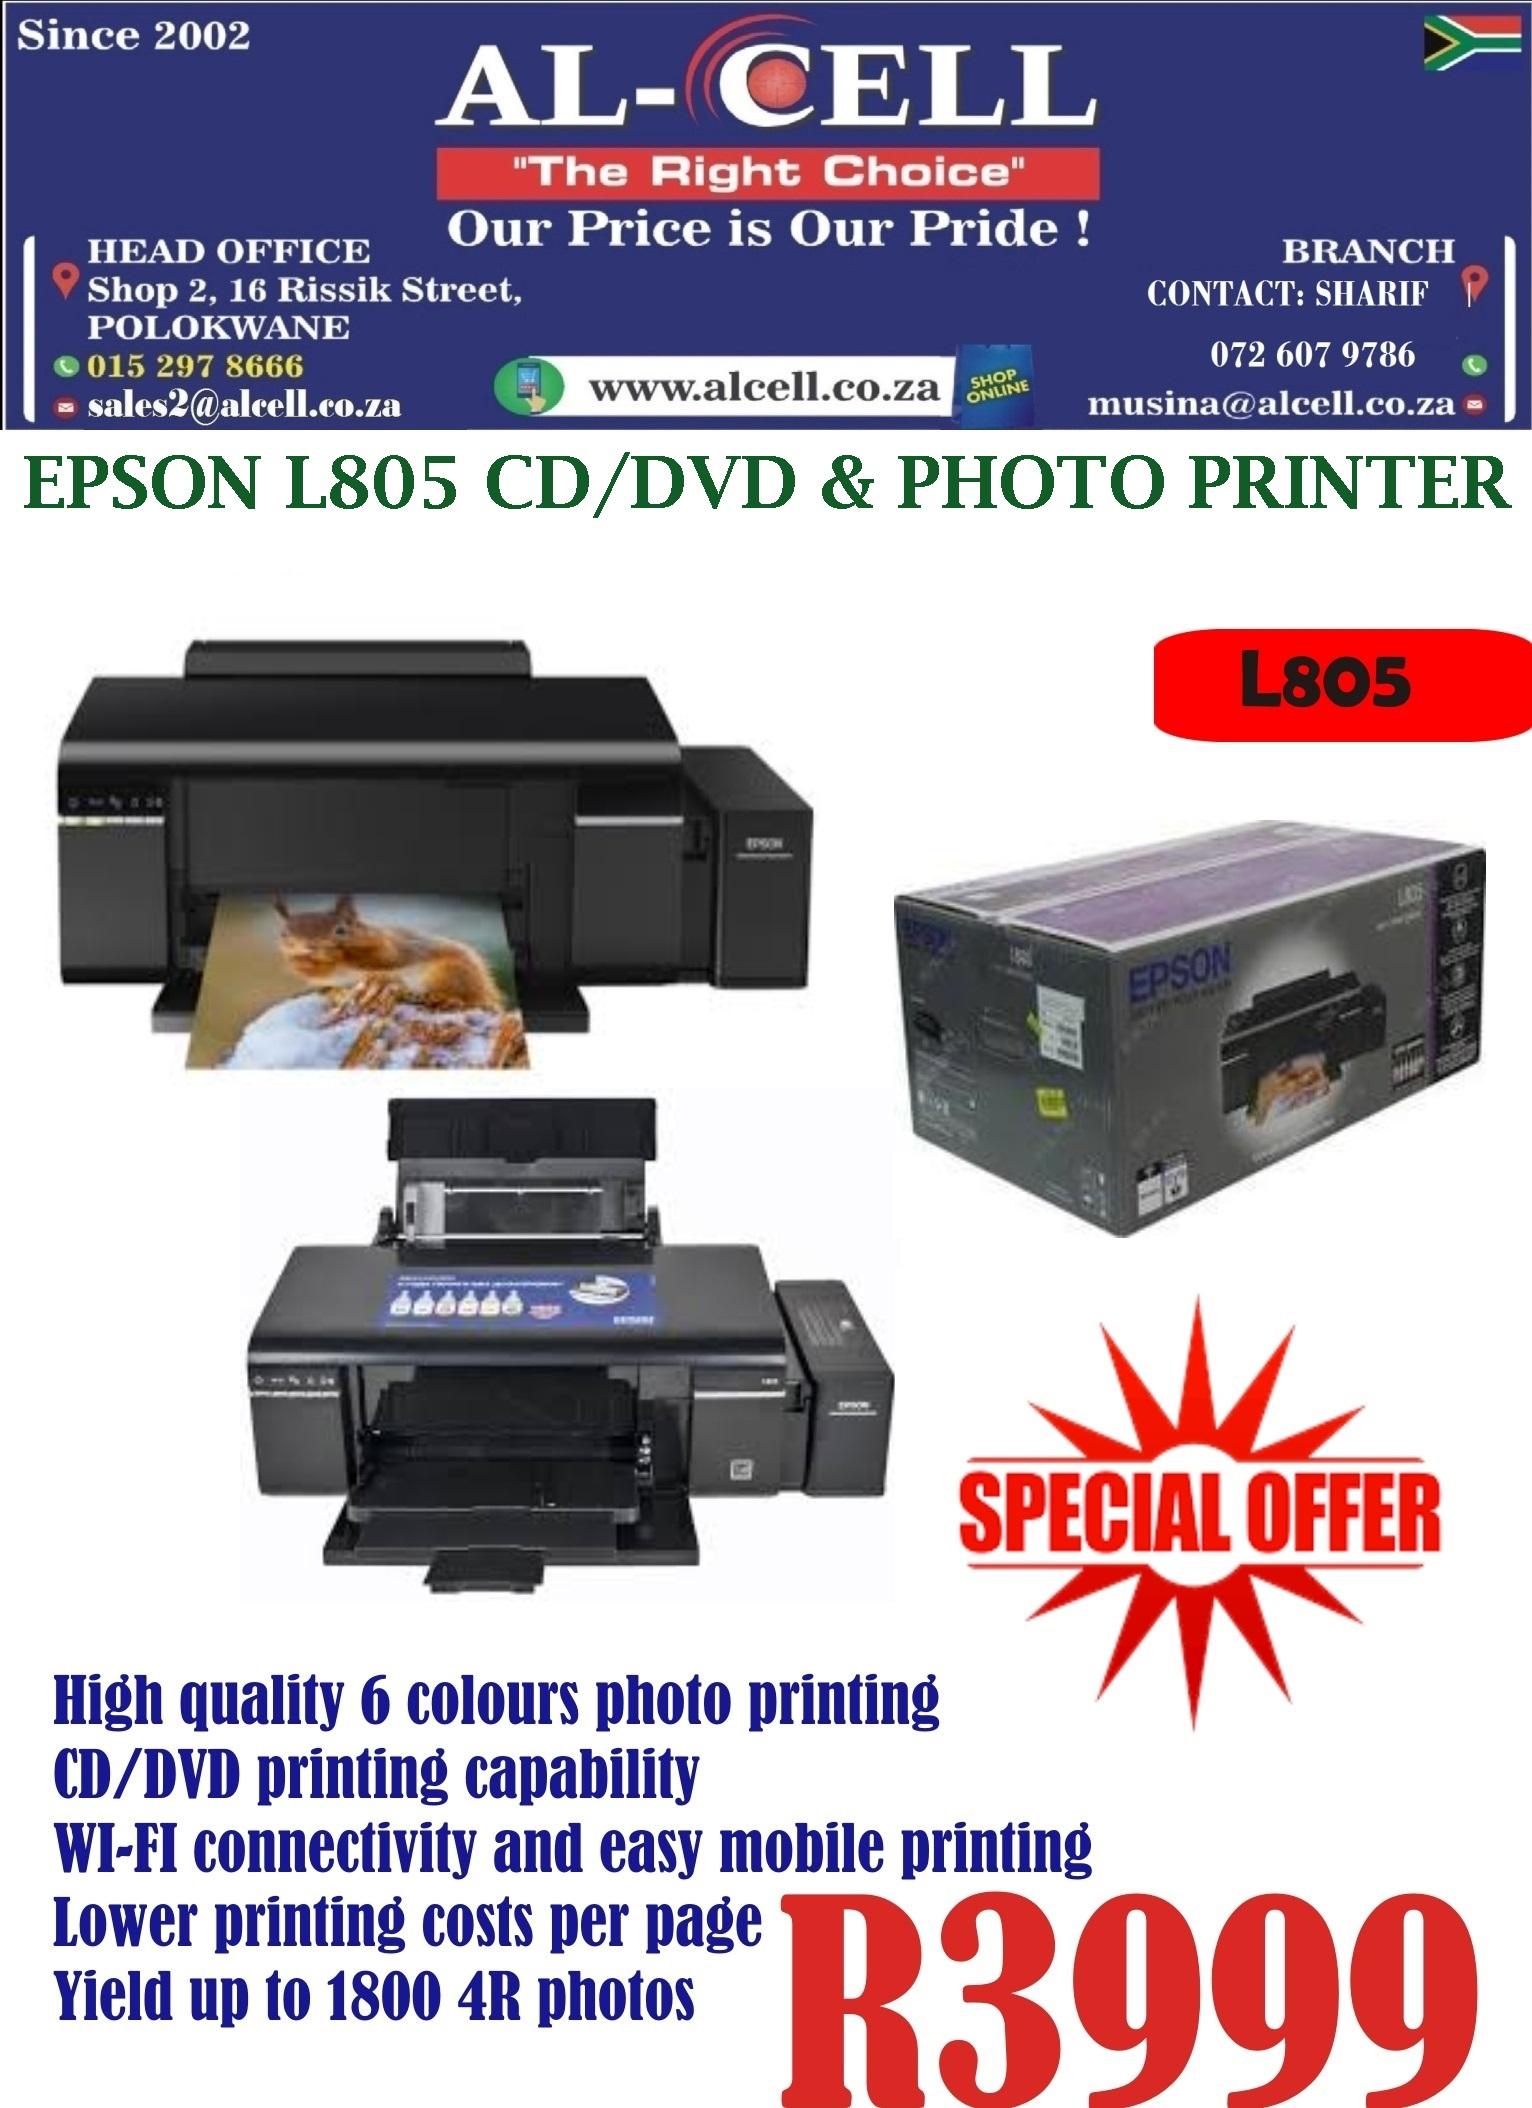 Epson L805 CD/DVD & Photo Printer